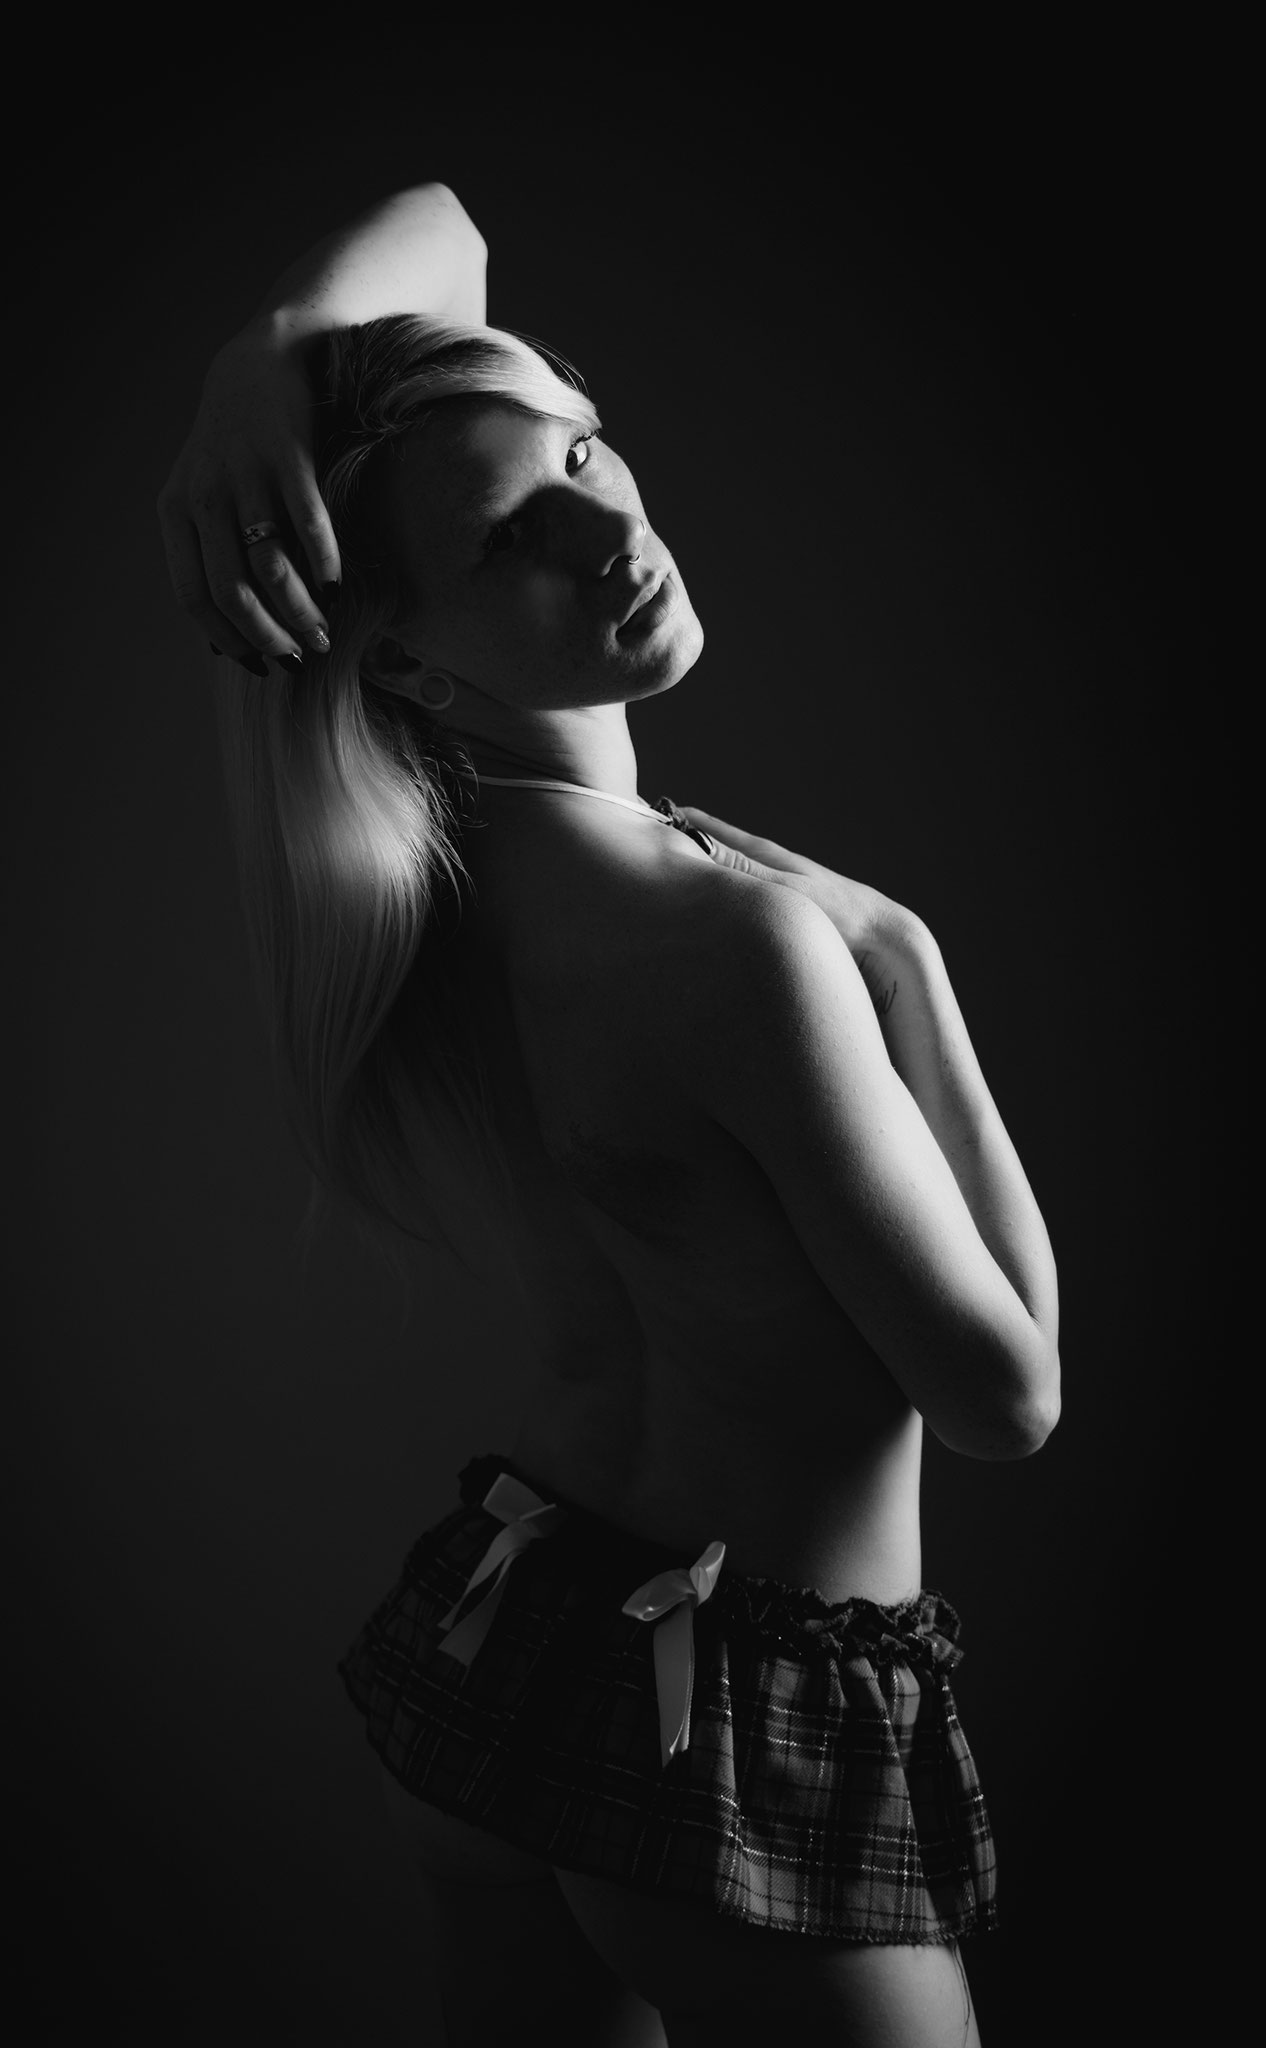 Sexy Pose beim Dessous Fotoshooting mit Escort Dame - Erotic Photos Nürnberg